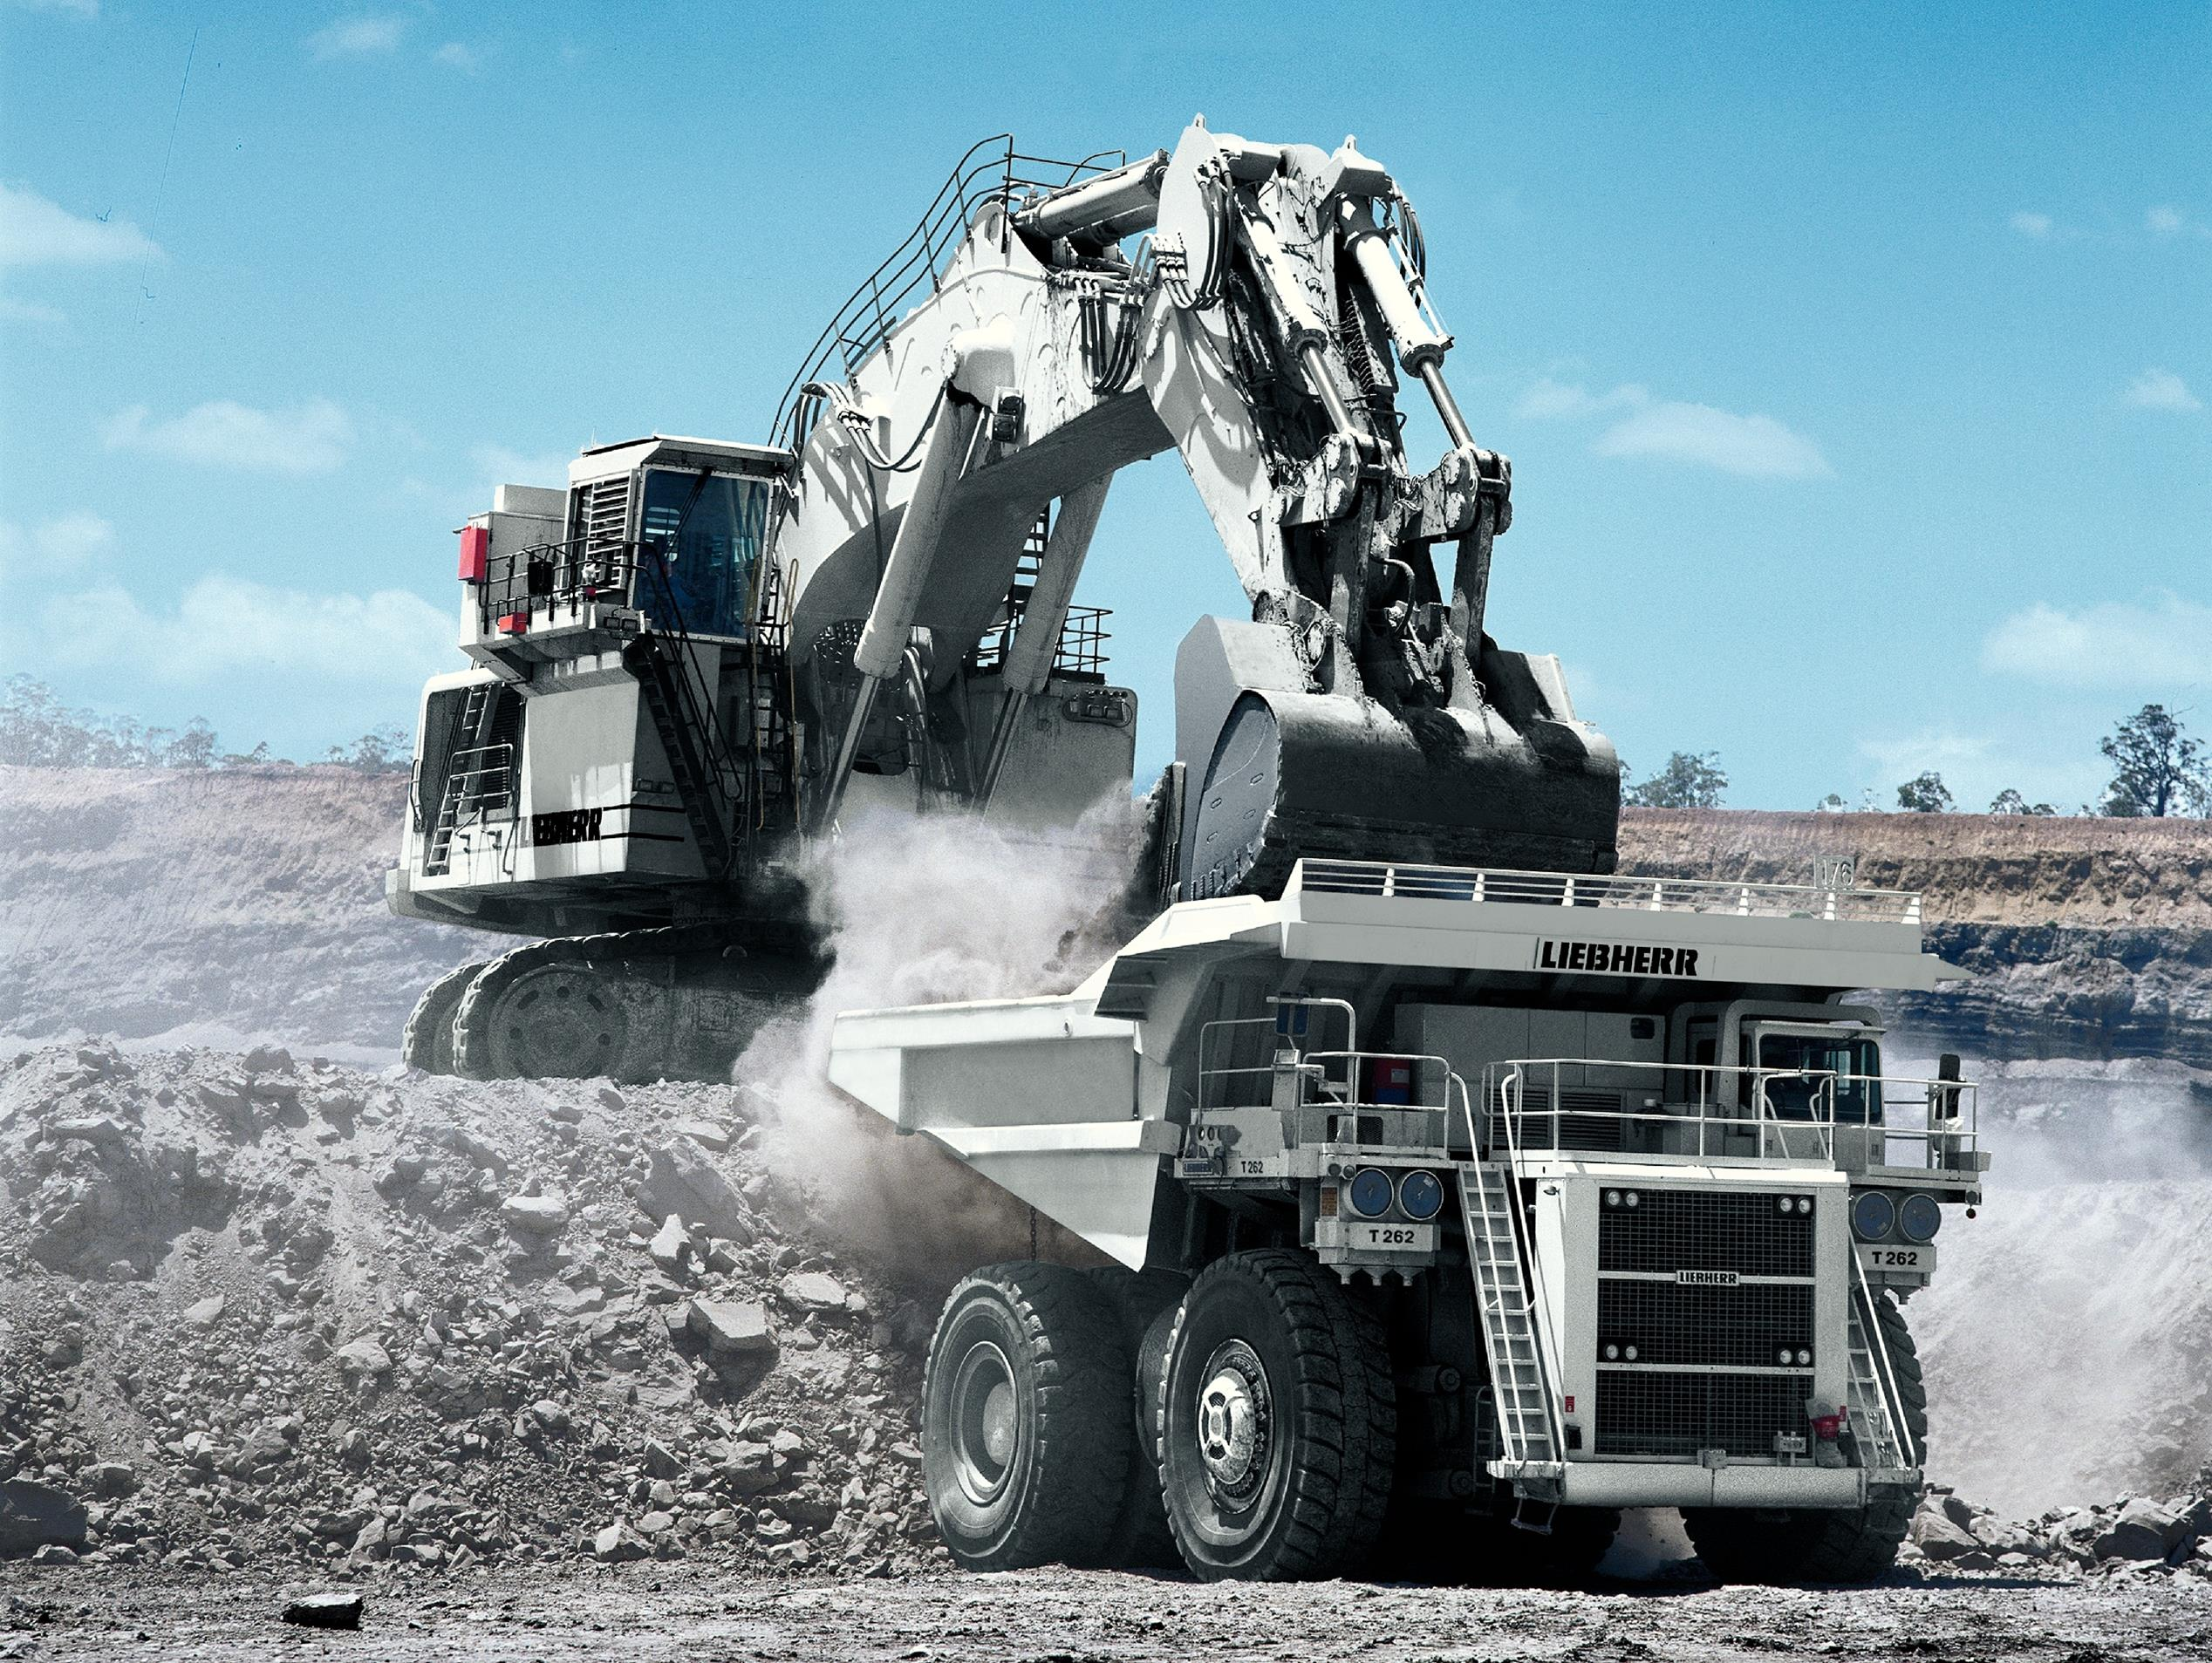 Mining liebherr - Mining images hd ...